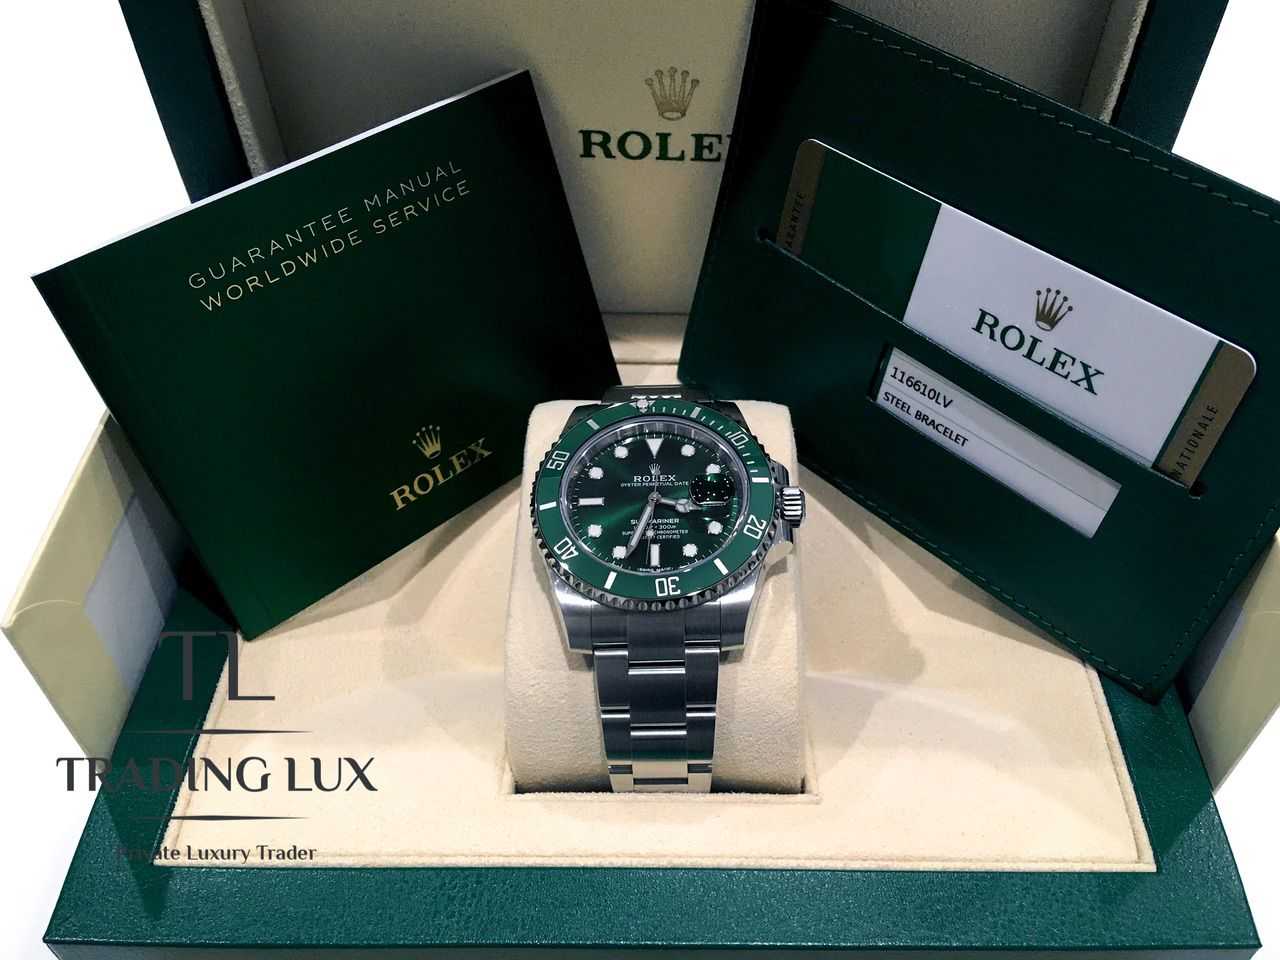 Rolex-116610LV-Hulk-11